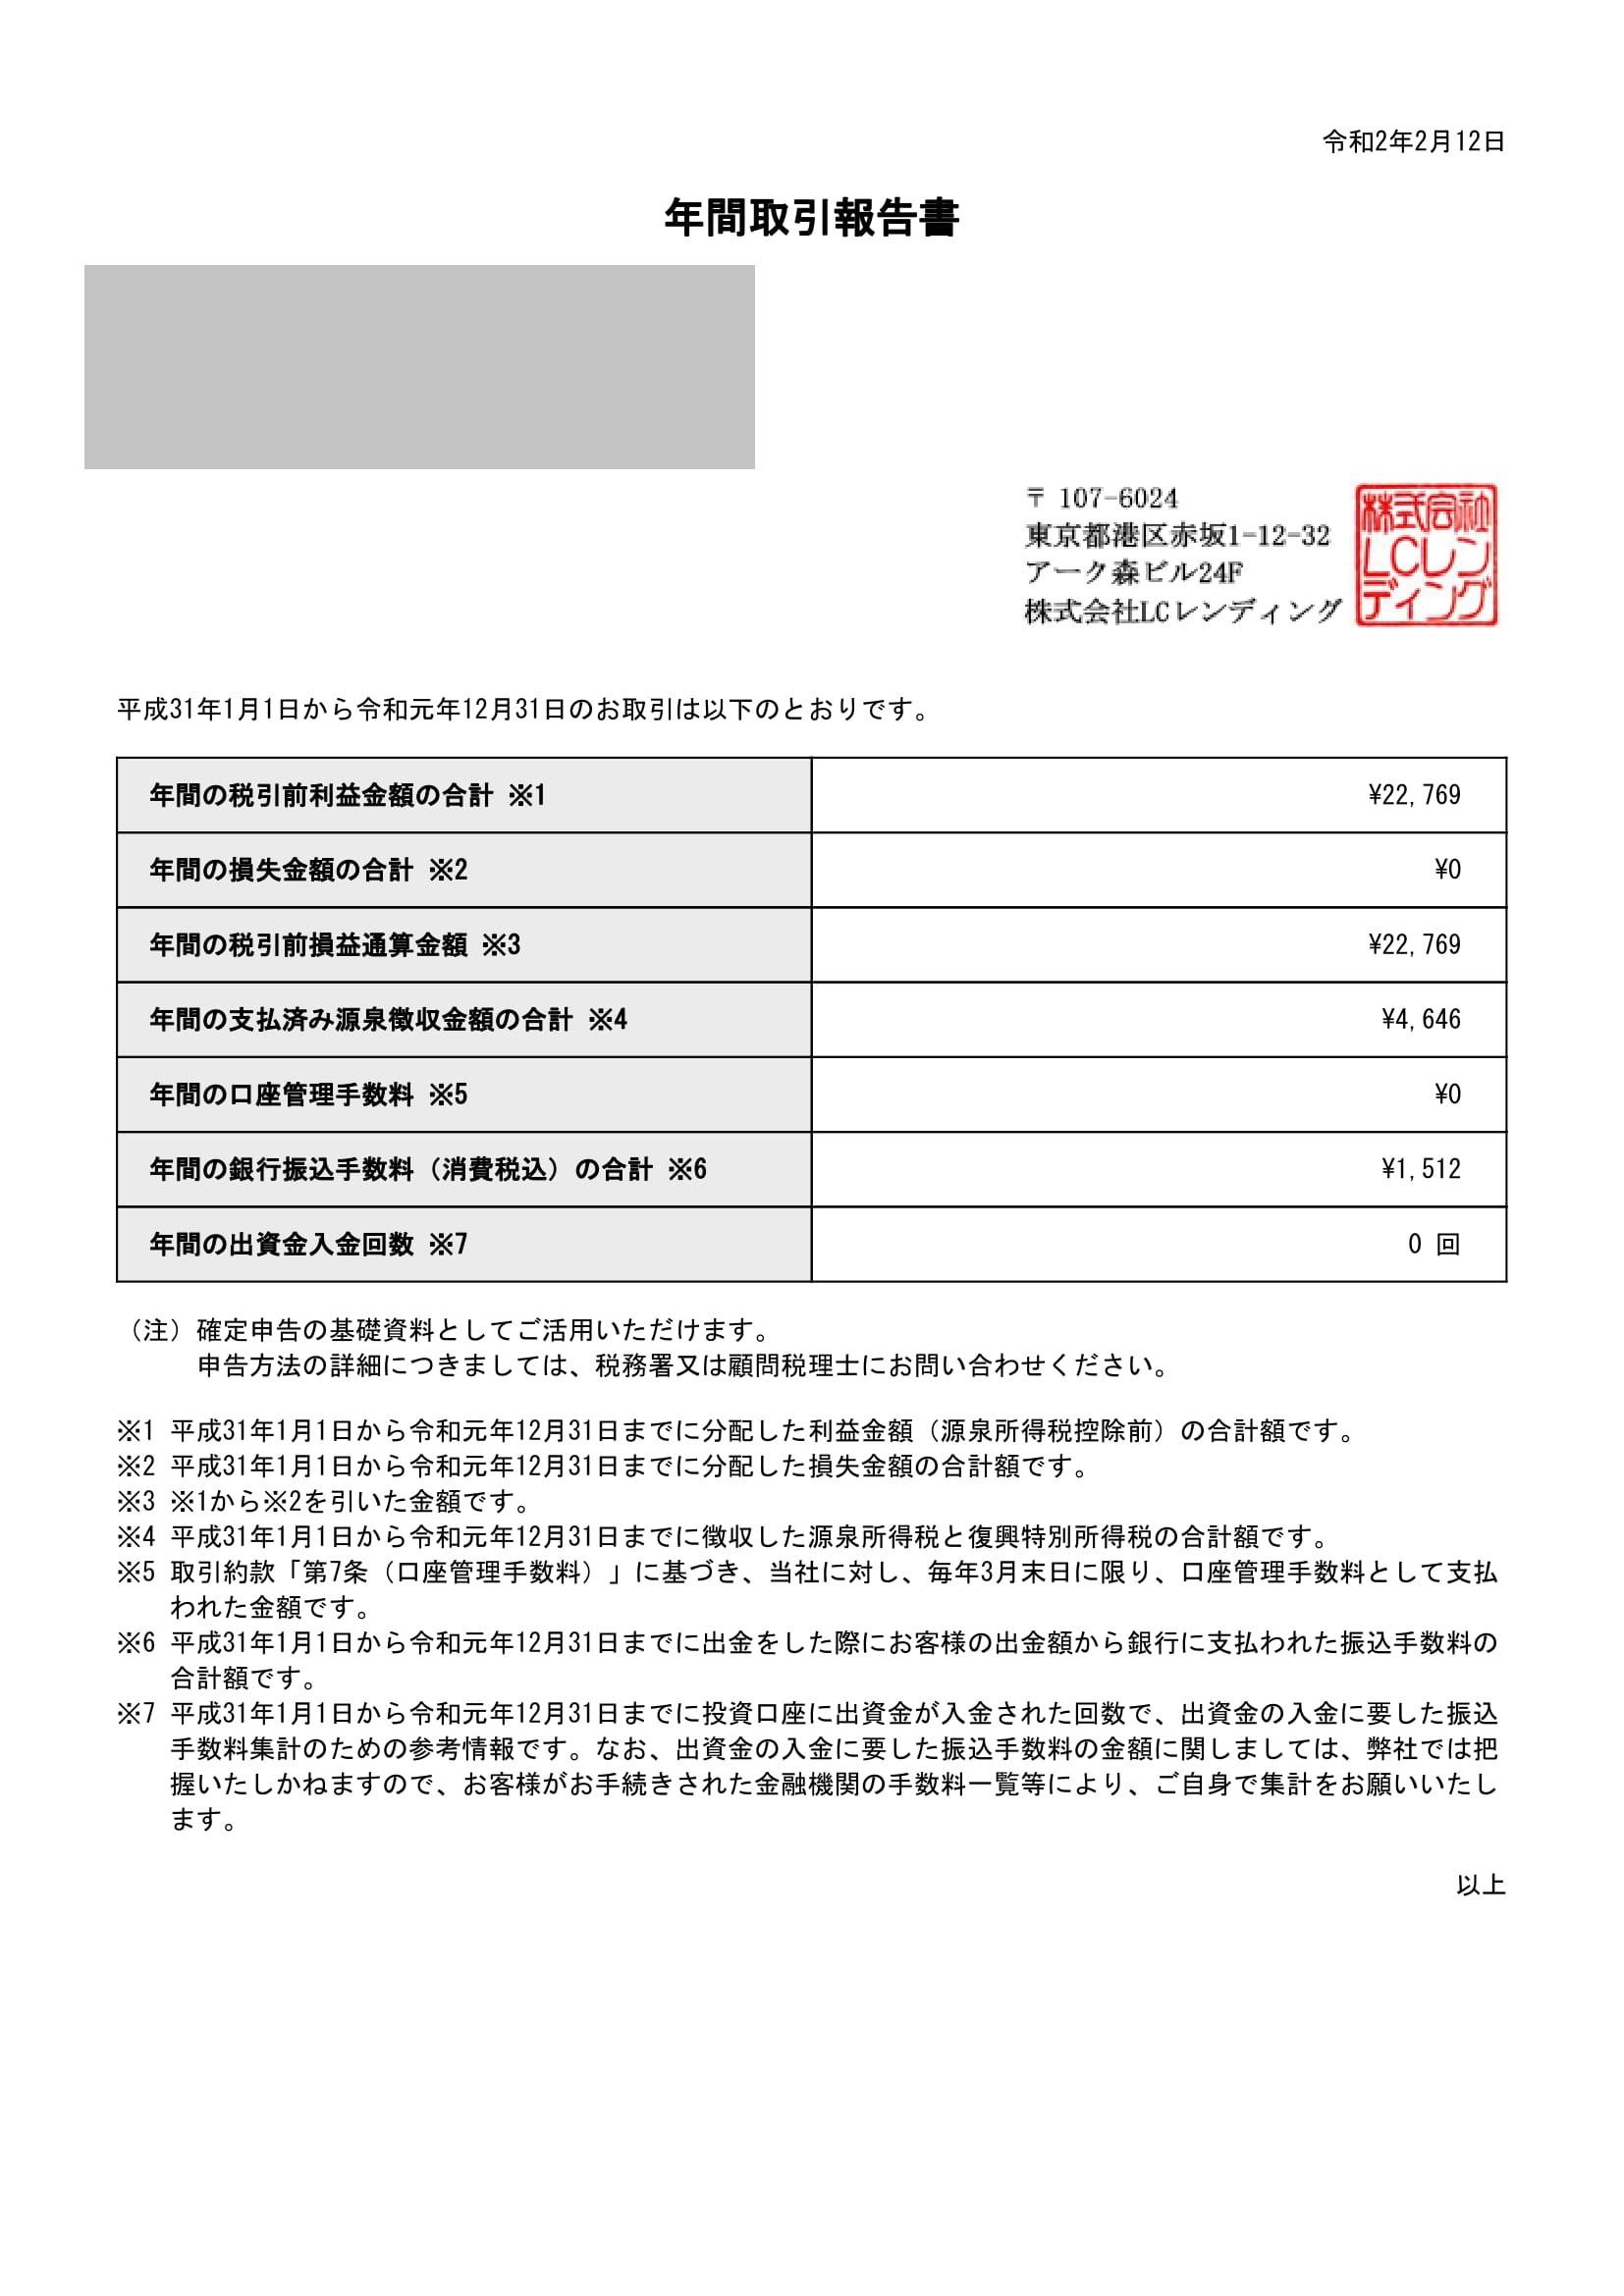 LCLENDING年間取引報告書_353_20200212-1